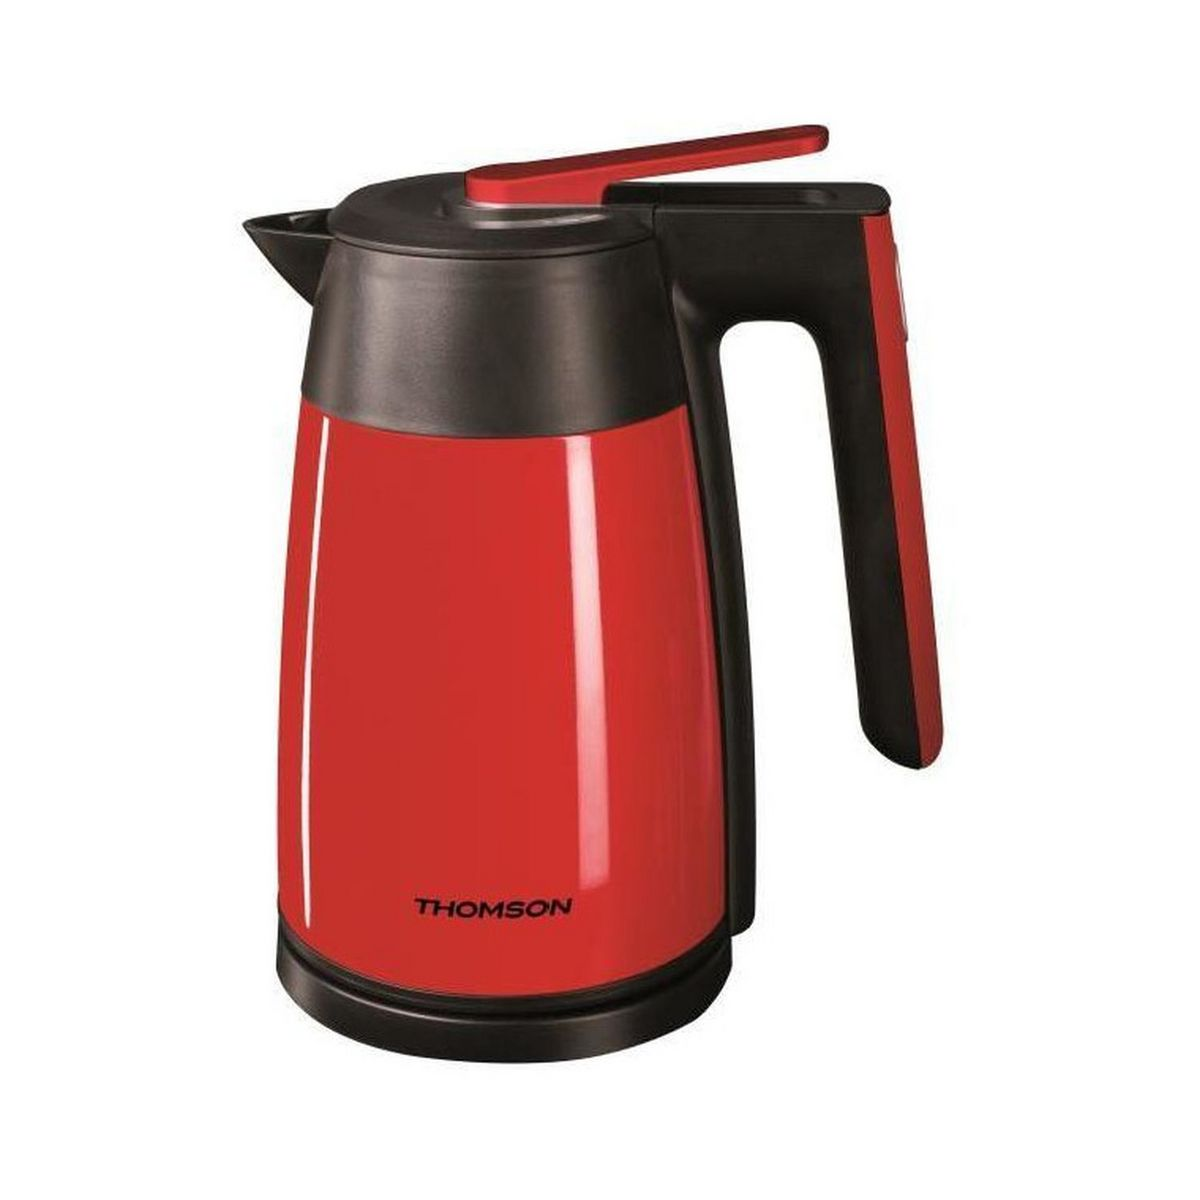 Bouilloire THKE9116R - Rouge